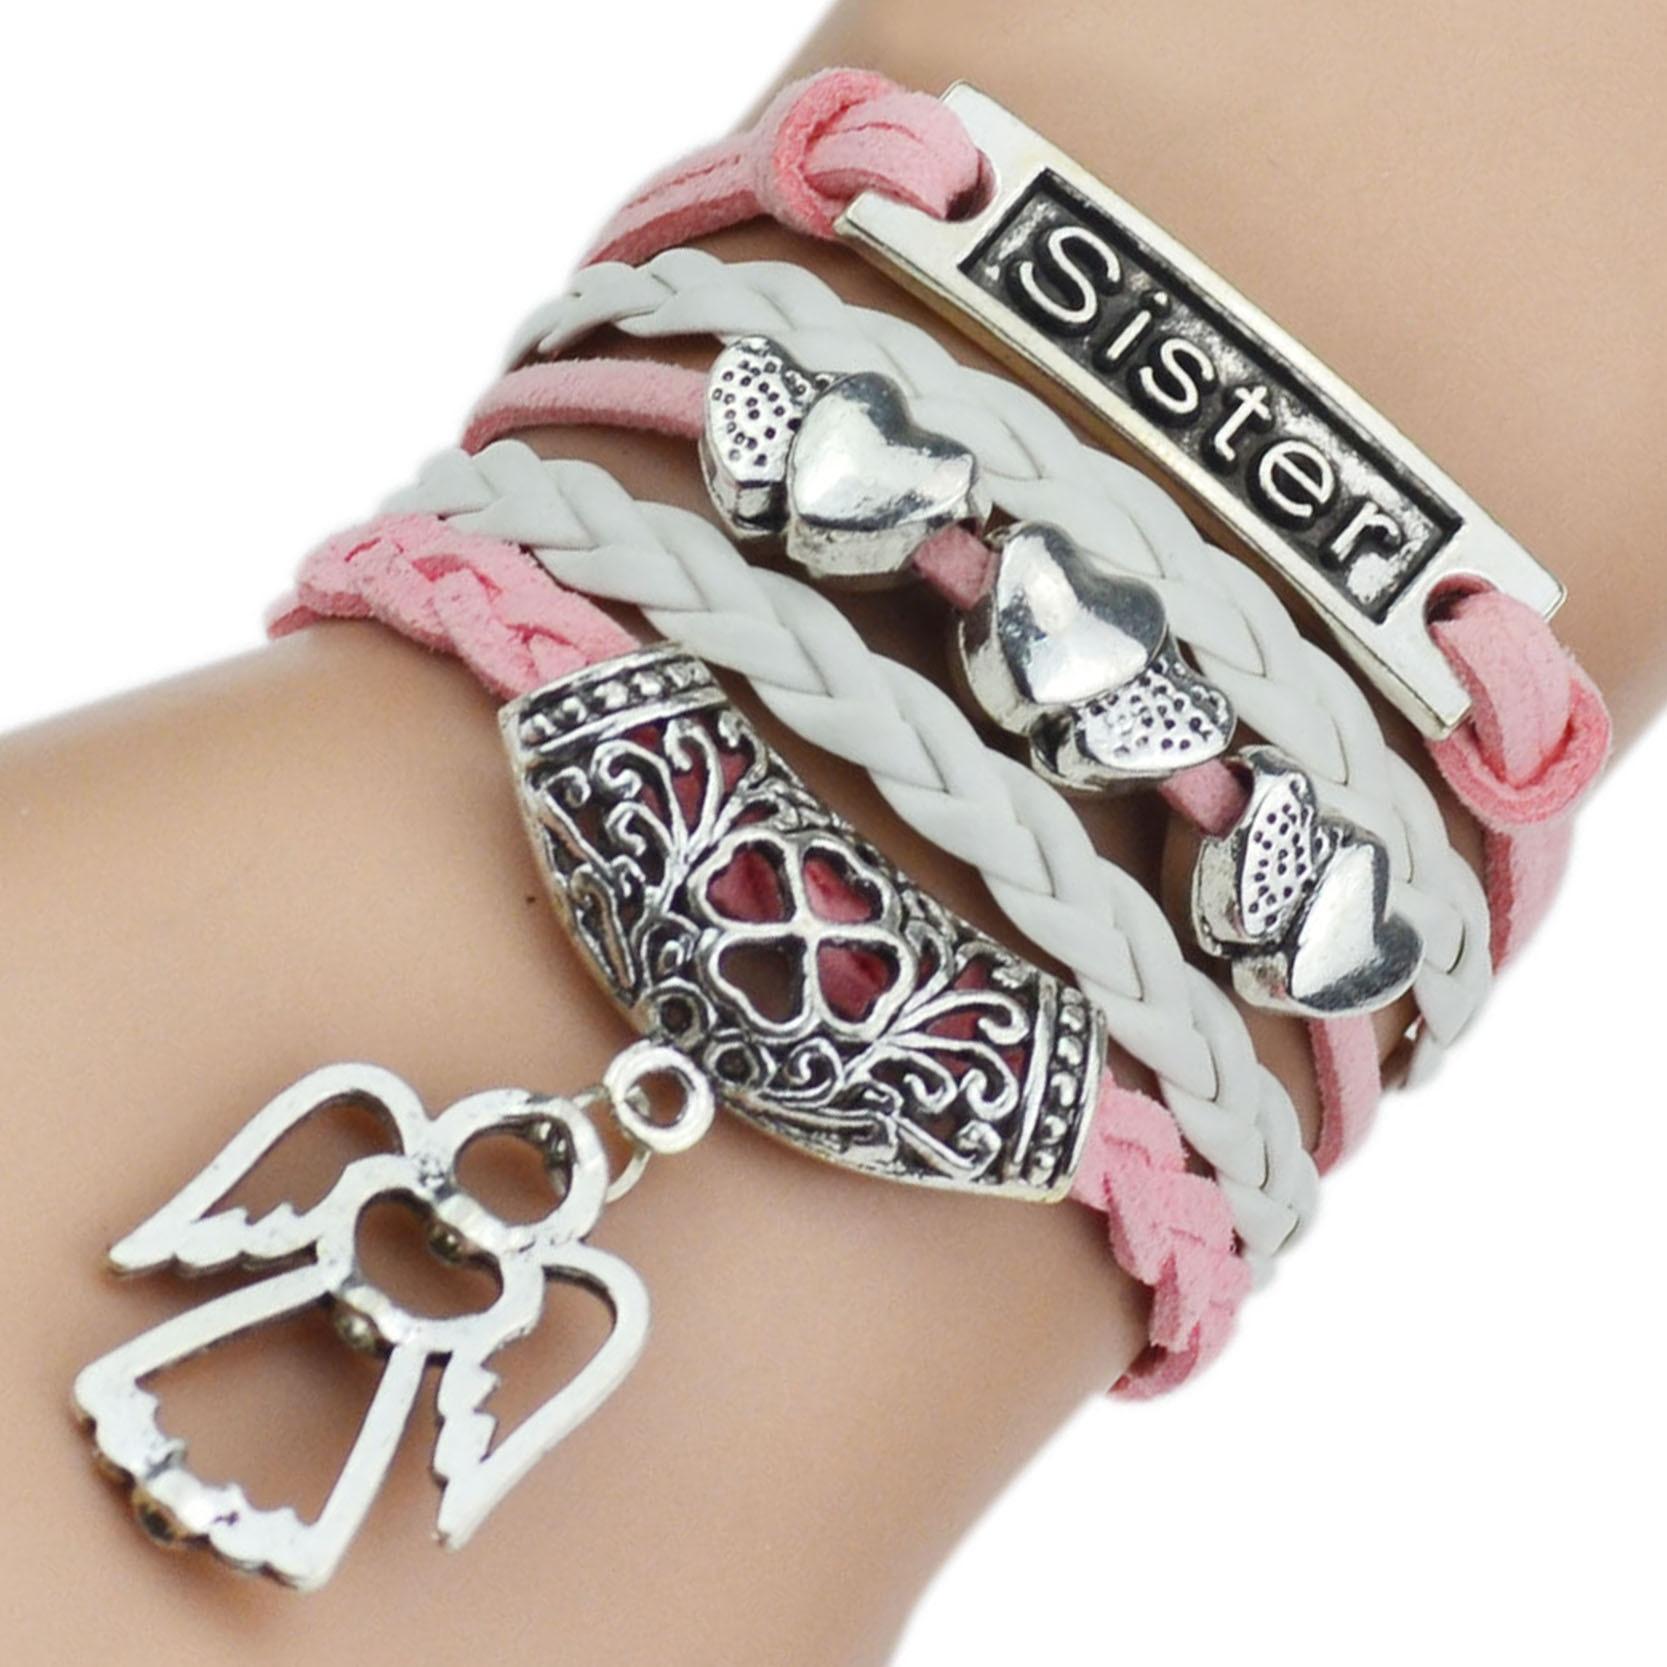 7 Colors 2017 New Fashion Leather Bracelets & Bangles Silver Owl Tree Love Bracelets for Women Men Hot Sale Fashion Jewelry 2